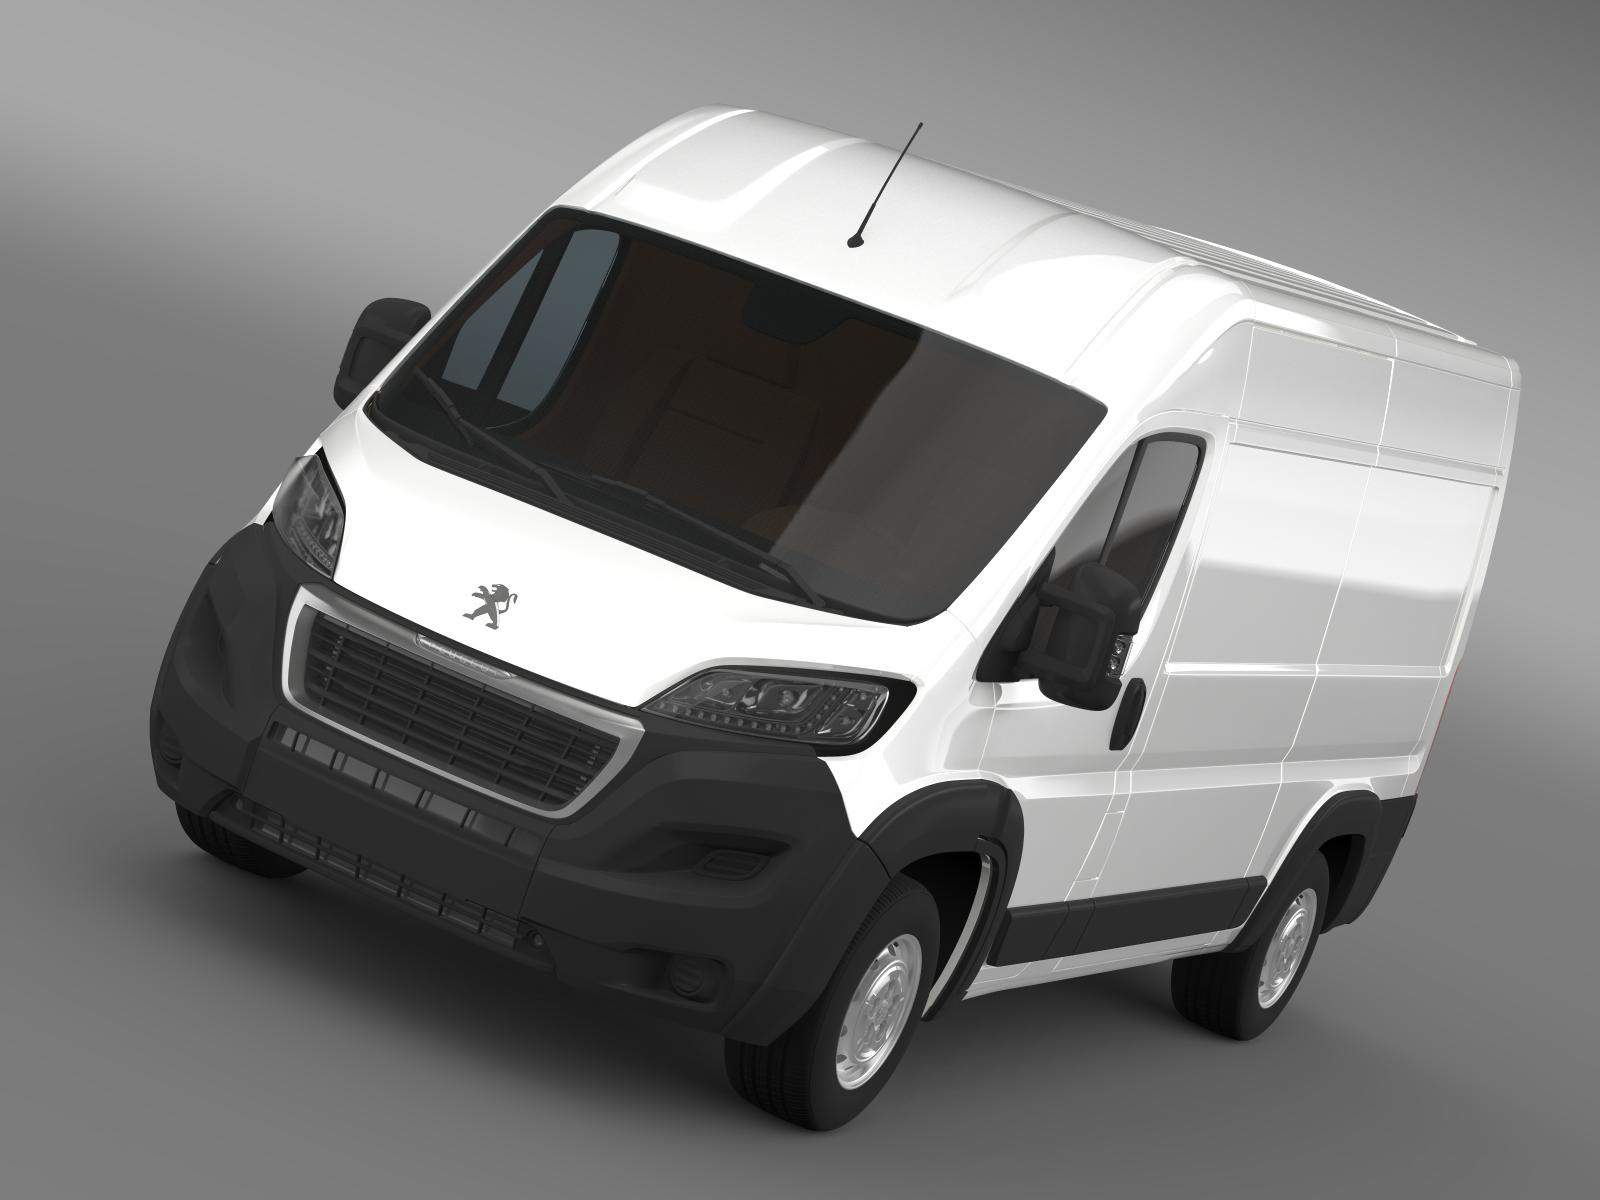 peugeot meneceri furgon l2h2 2014 3d model 3ds max fbx c4d lwo ma mb hrc xsi obj 203137